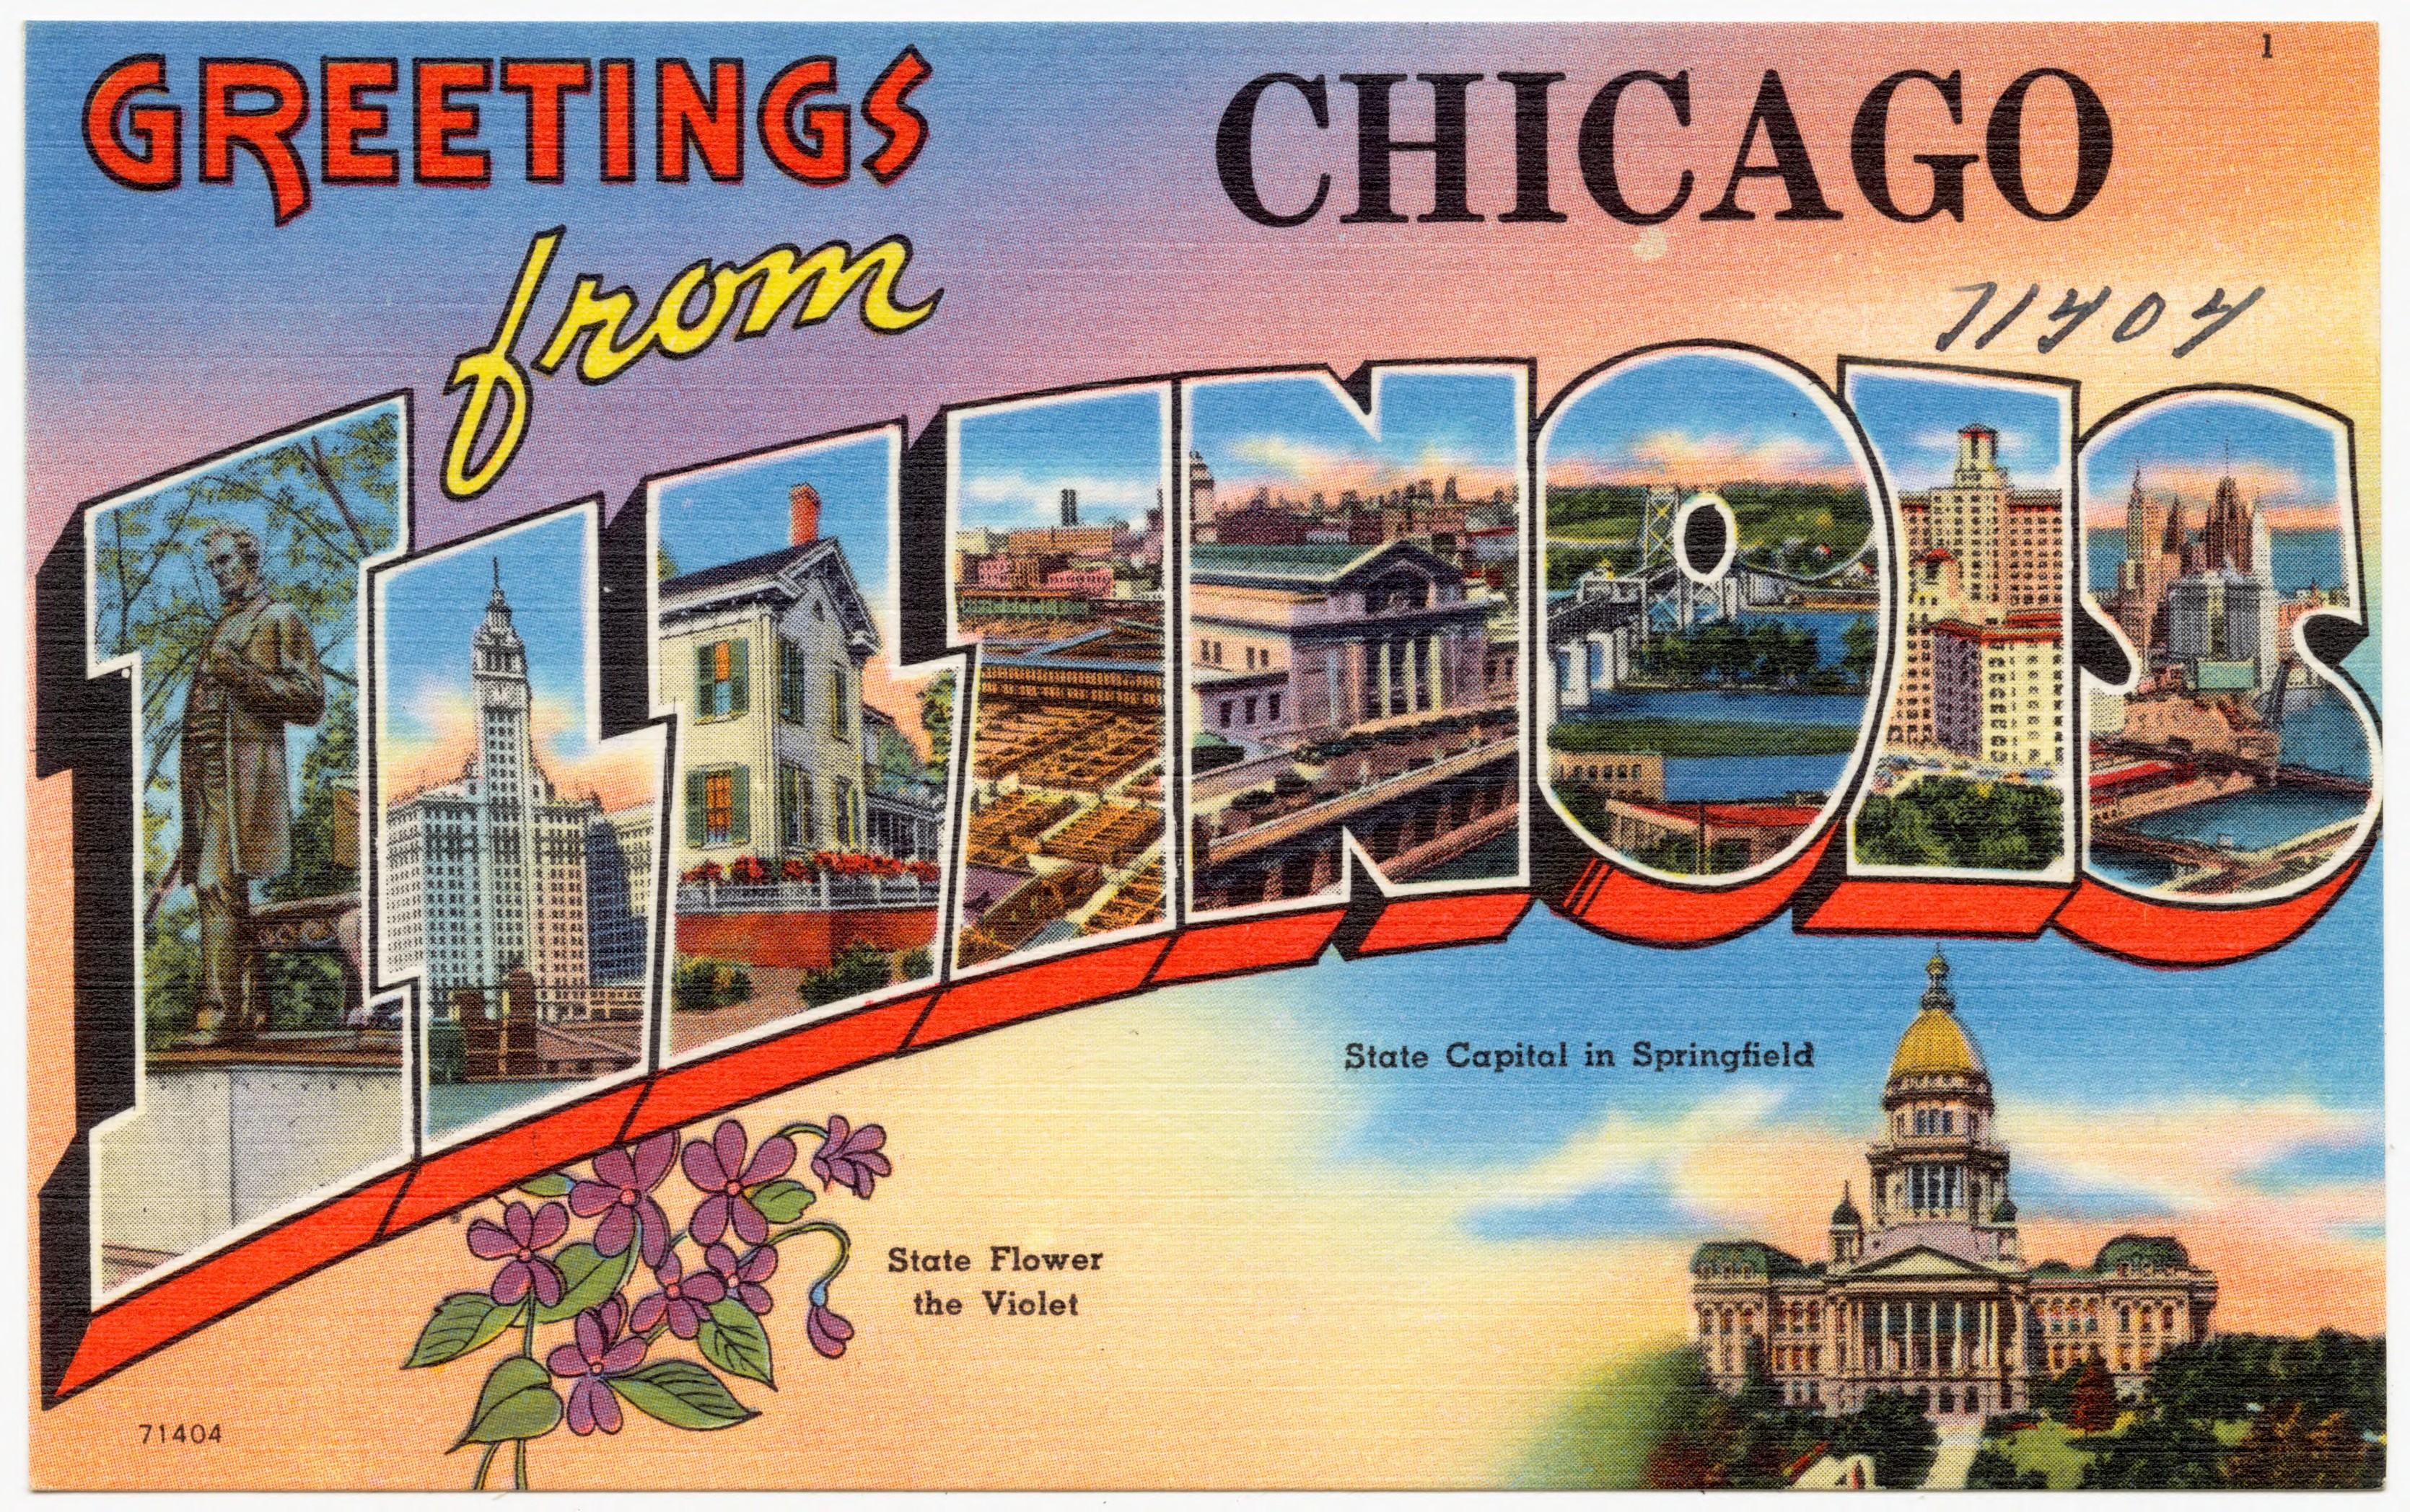 FileGreetings From Chicago Illinois 71404jpg